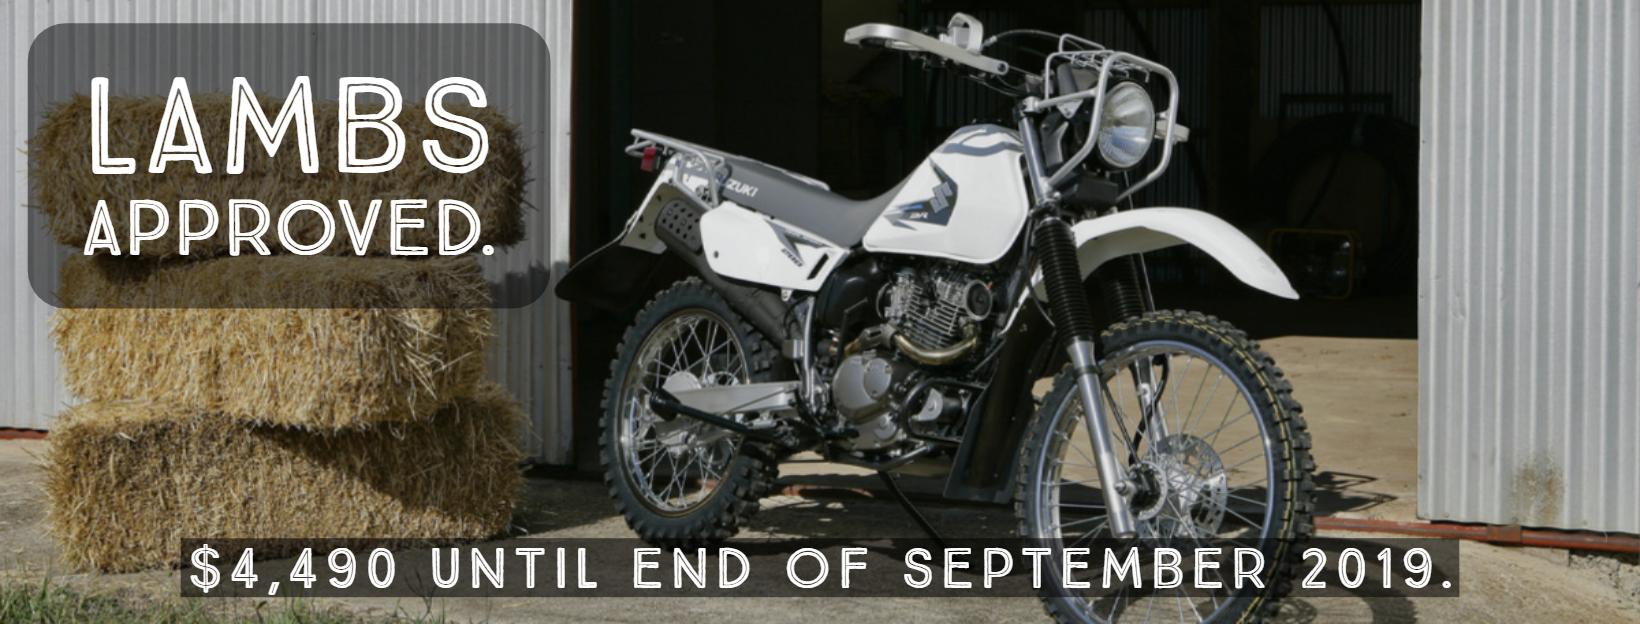 Suzuki Trojan Ag Bike on sale for $4490 ride away until end of September 2019.